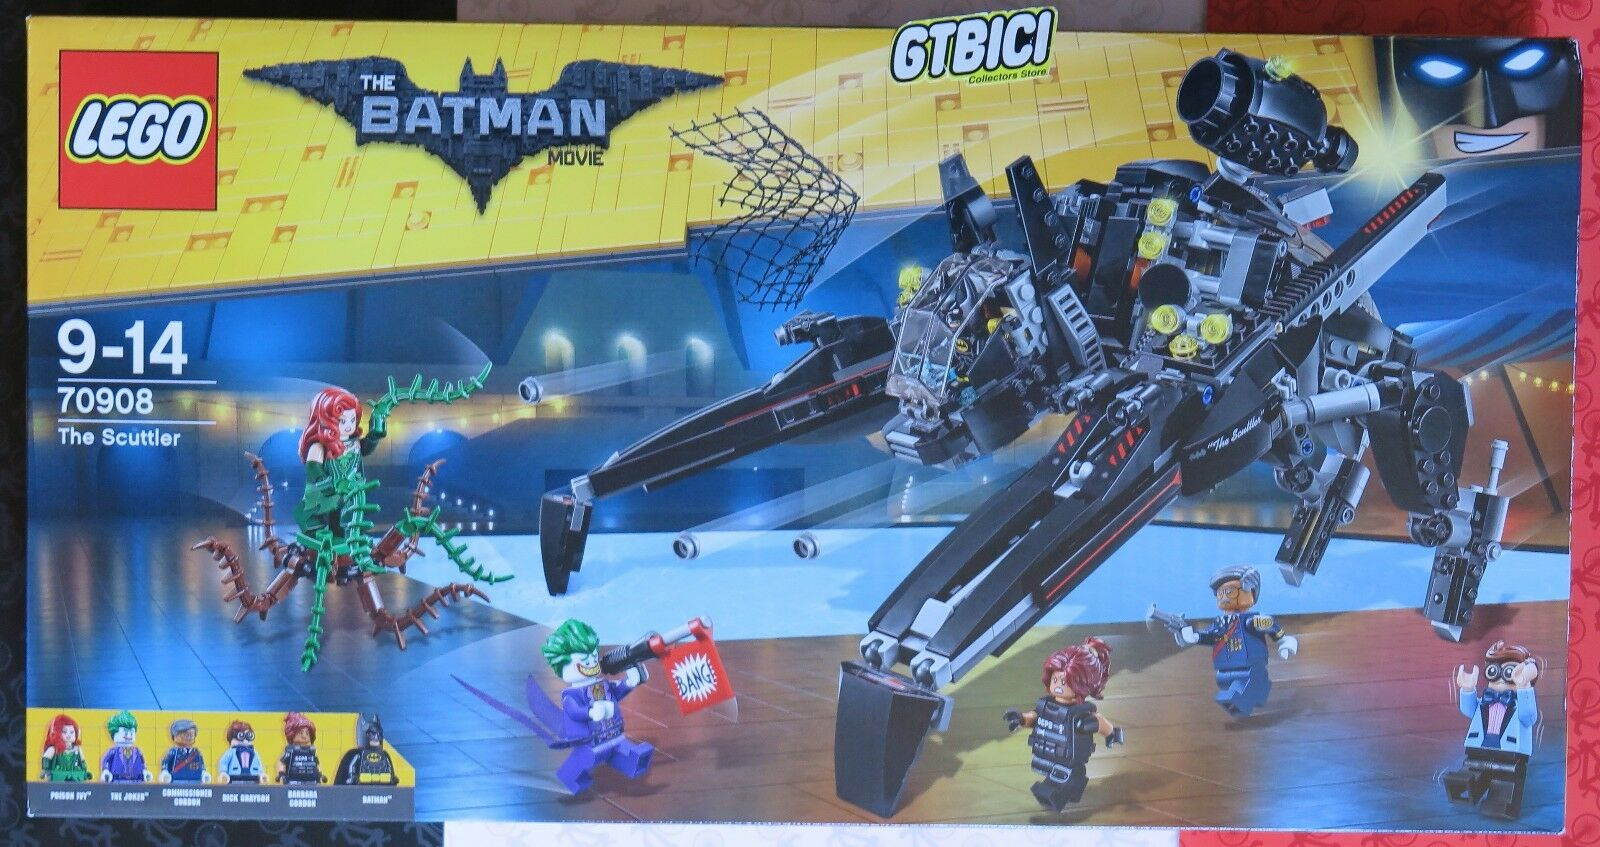 LEGO THE BATMAN MOVIE  `` THE SCUTTLER ´´  Ref 70908  NUEVO A ESTRENAR